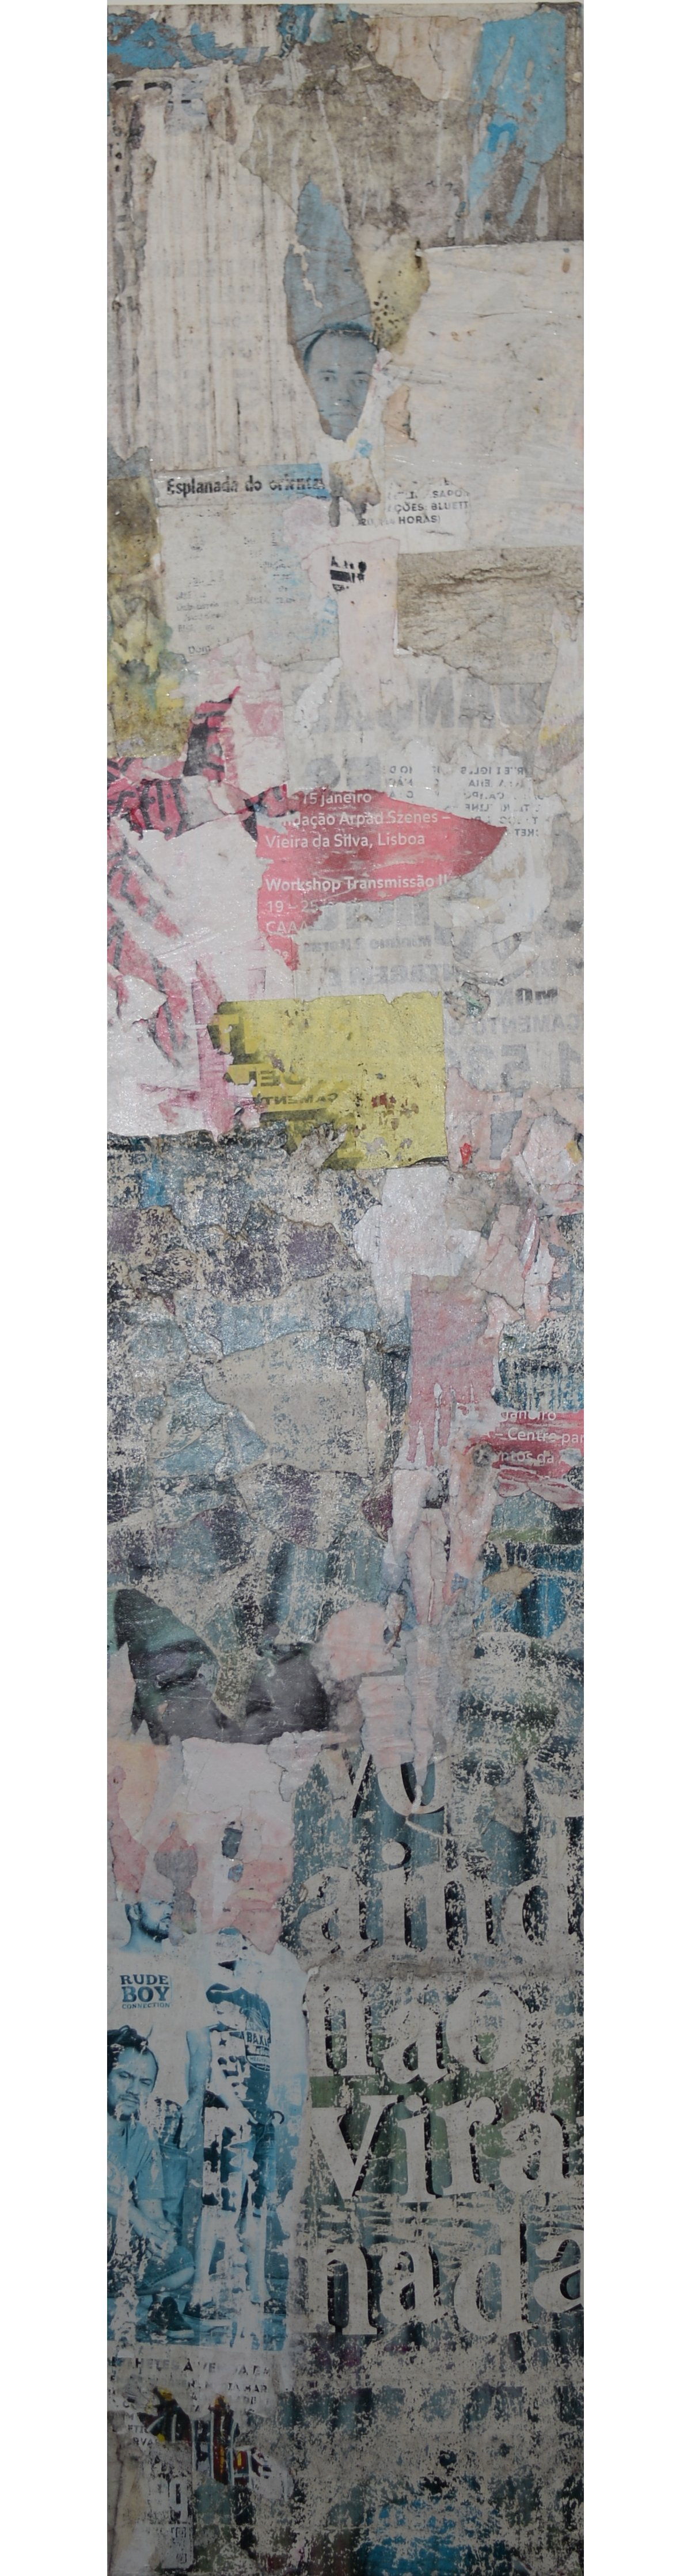 friederike-lydia-ahrens-popstreet-lisboa-2015